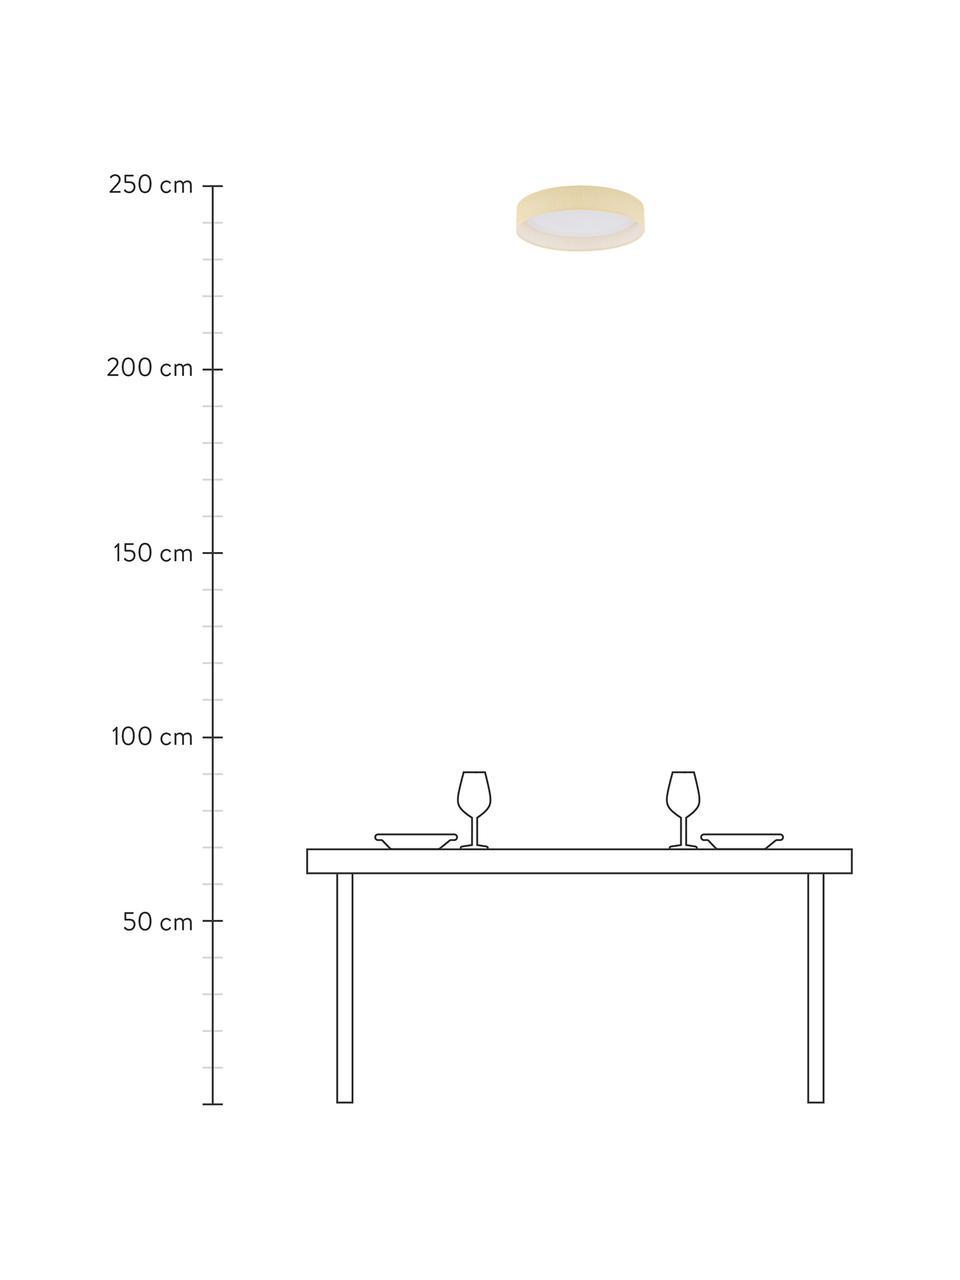 Lampa sufitowa LED Helen Nature, Beżowy, Ø 35 x W 7 cm